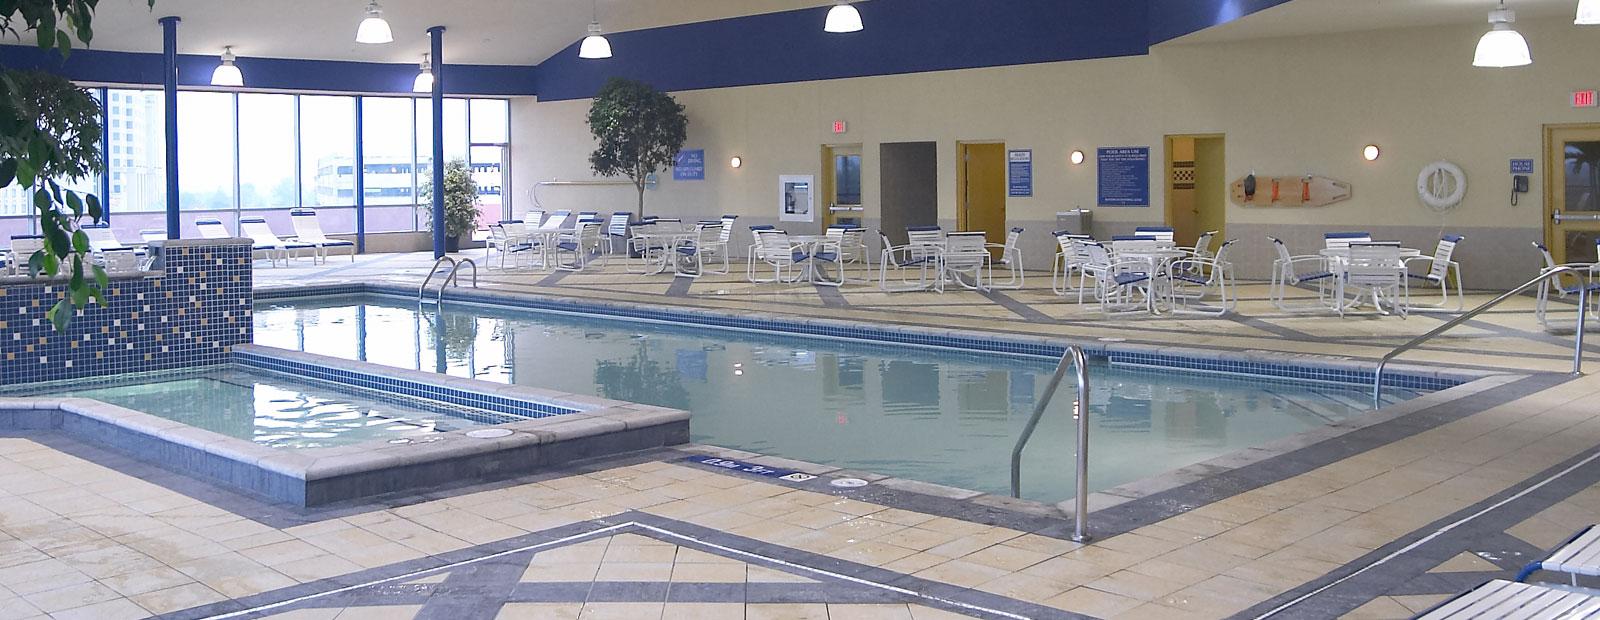 Amenities Embassy Suites By Hilton Niagara Falls Canada